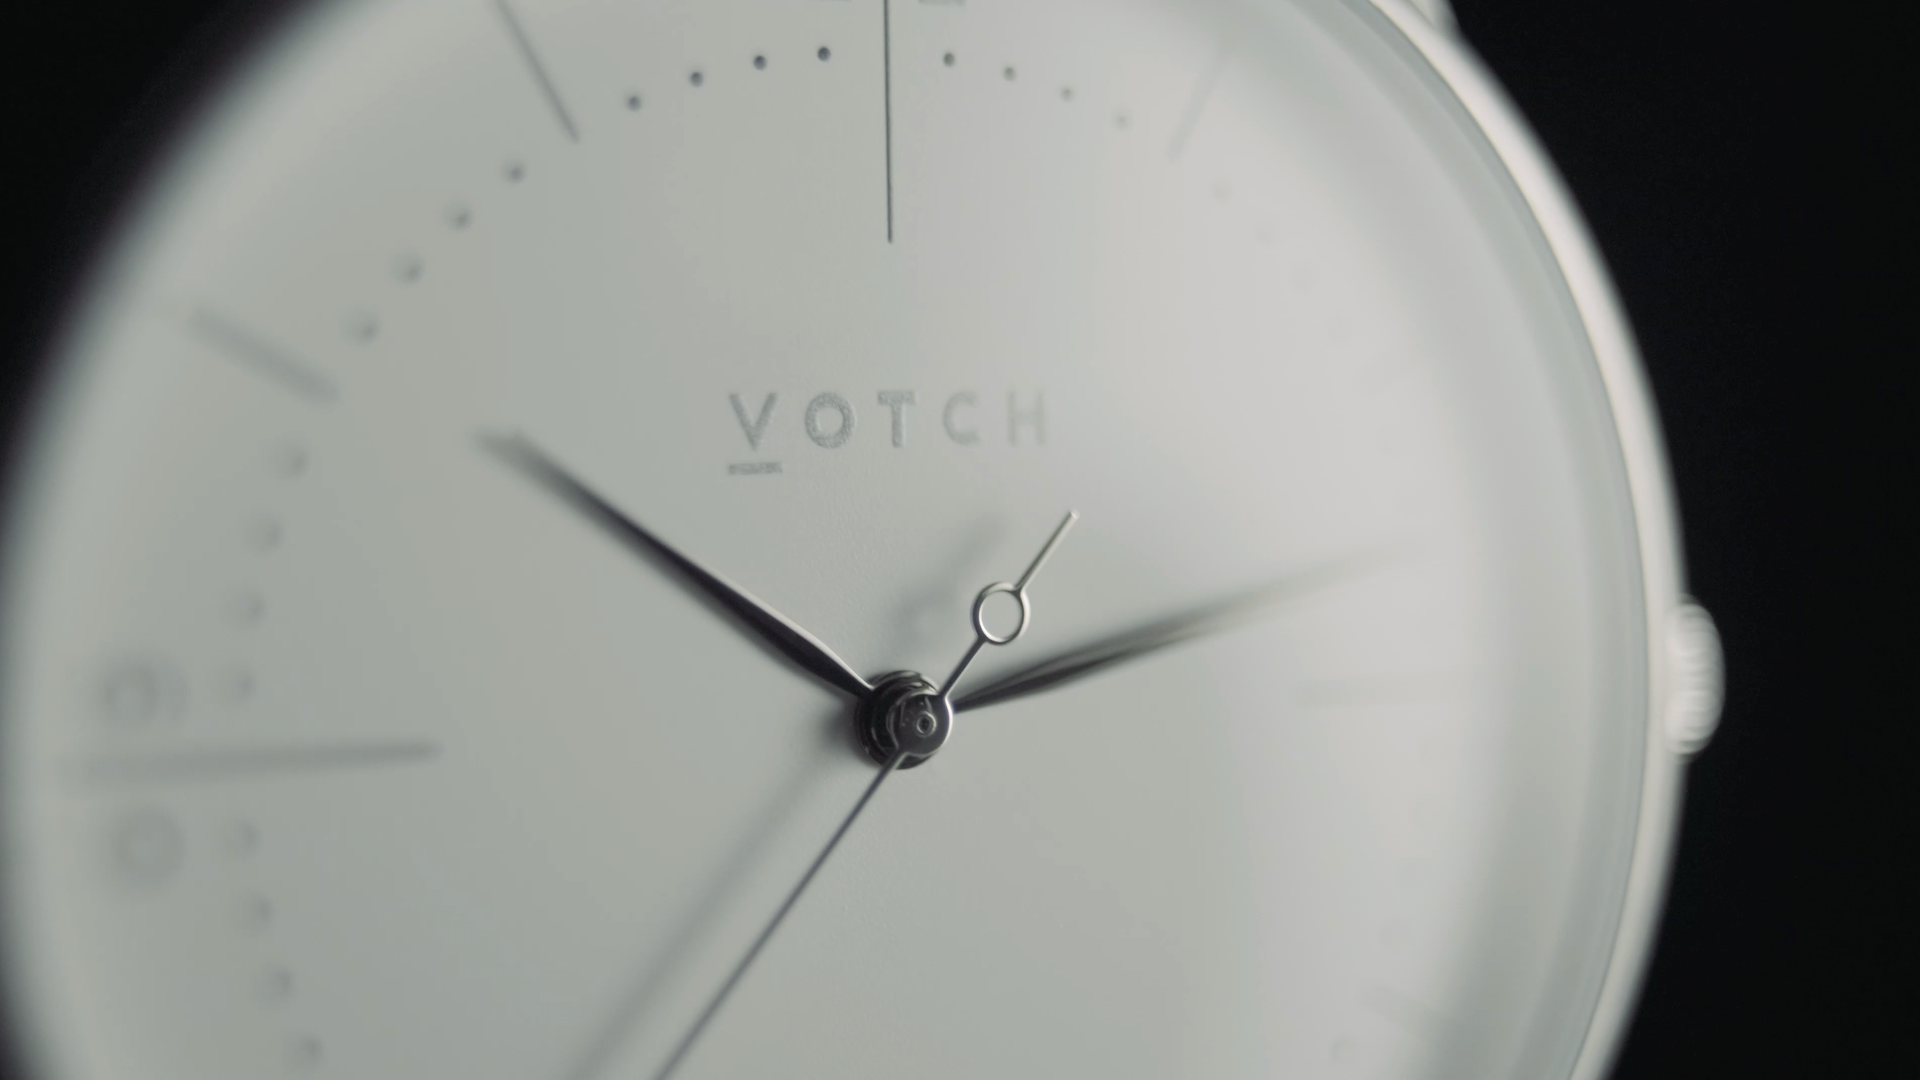 Votch - Aalto